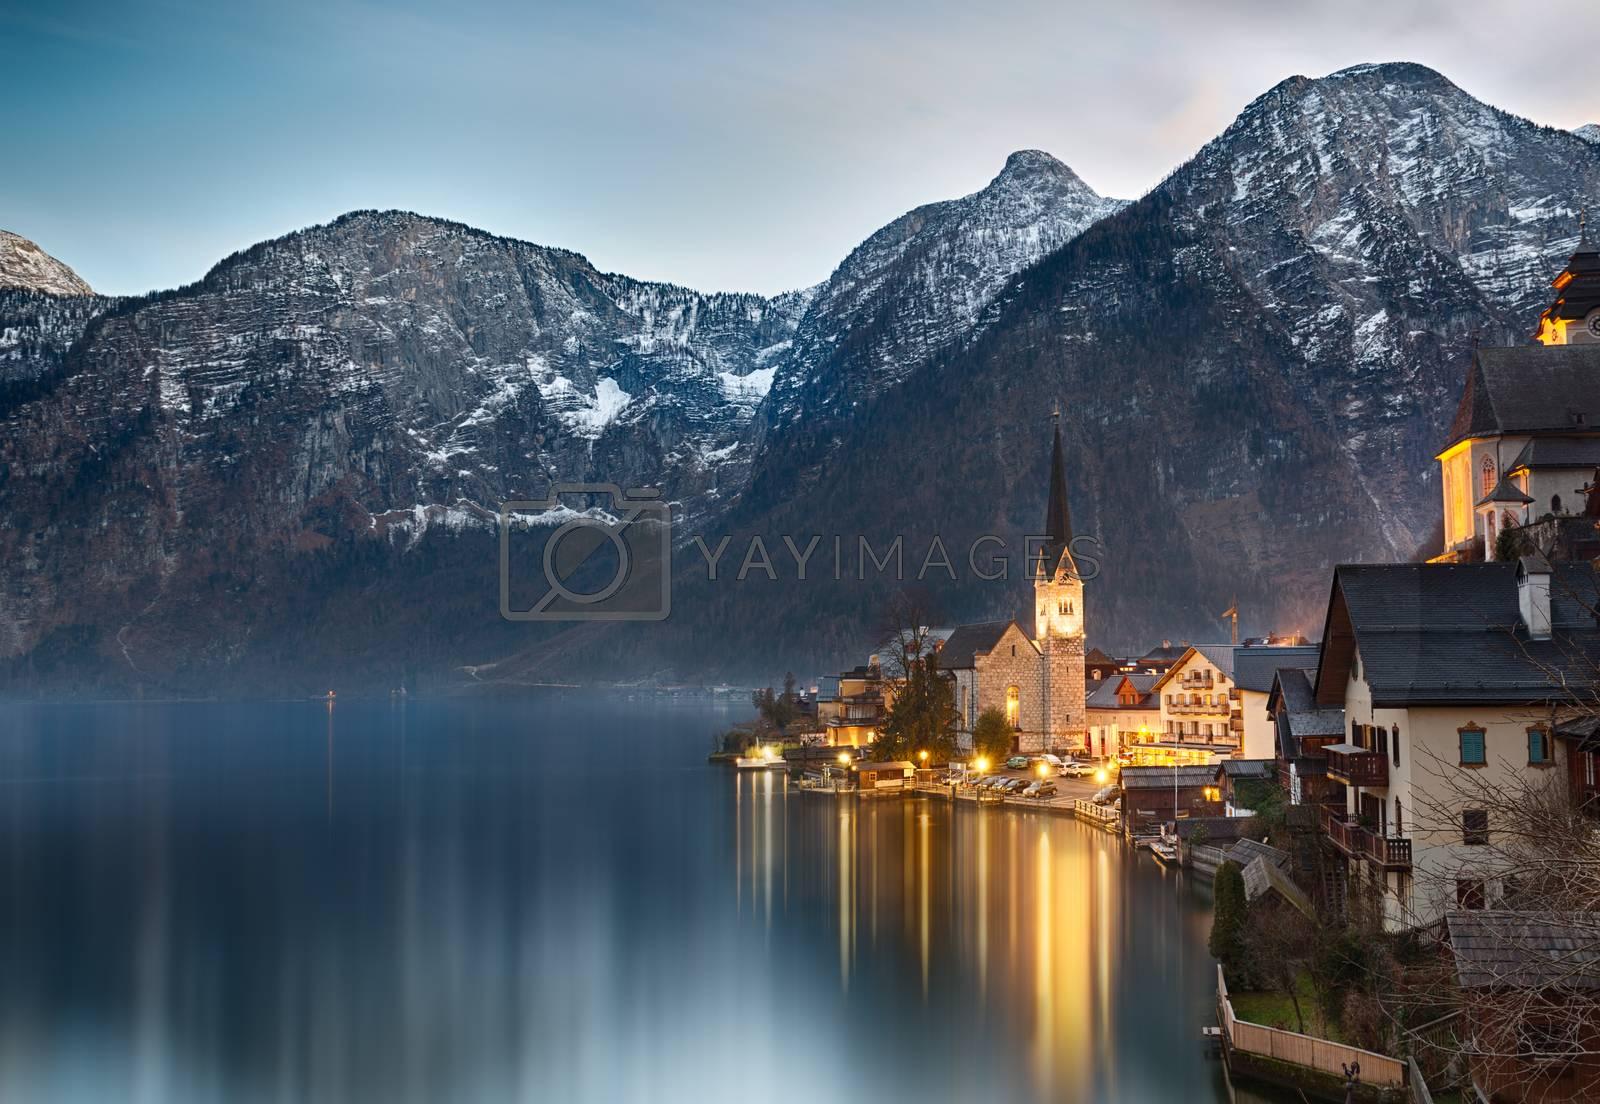 Royalty free image of Dusk at Lake Hallstatt, Salzkammergut, Austrian Alps by fisfra